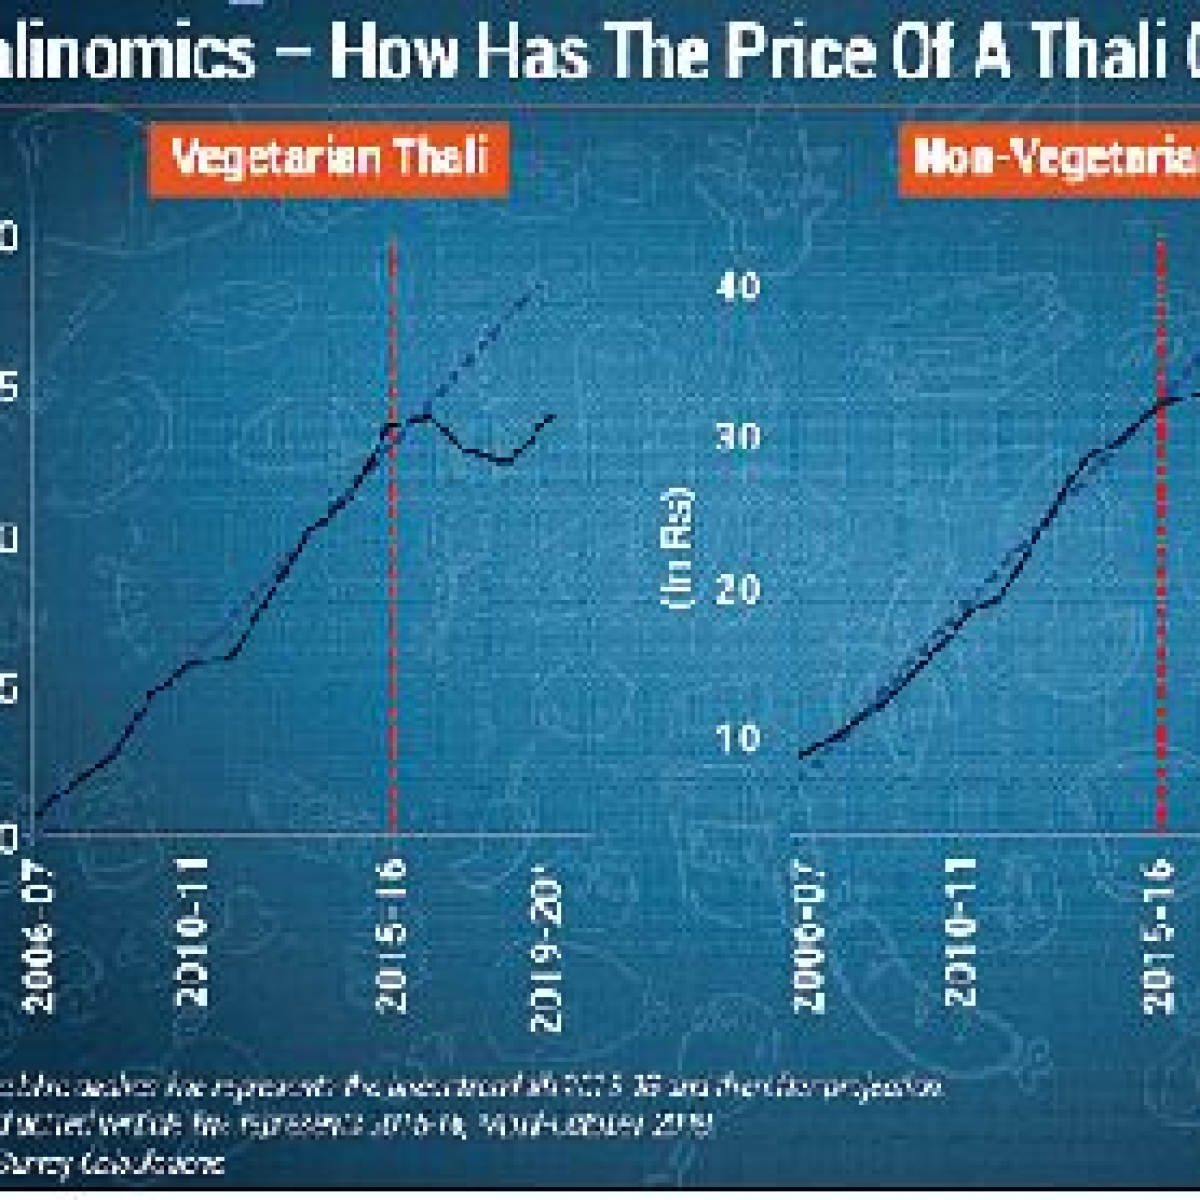 Thalinomics: Joke on your plate!